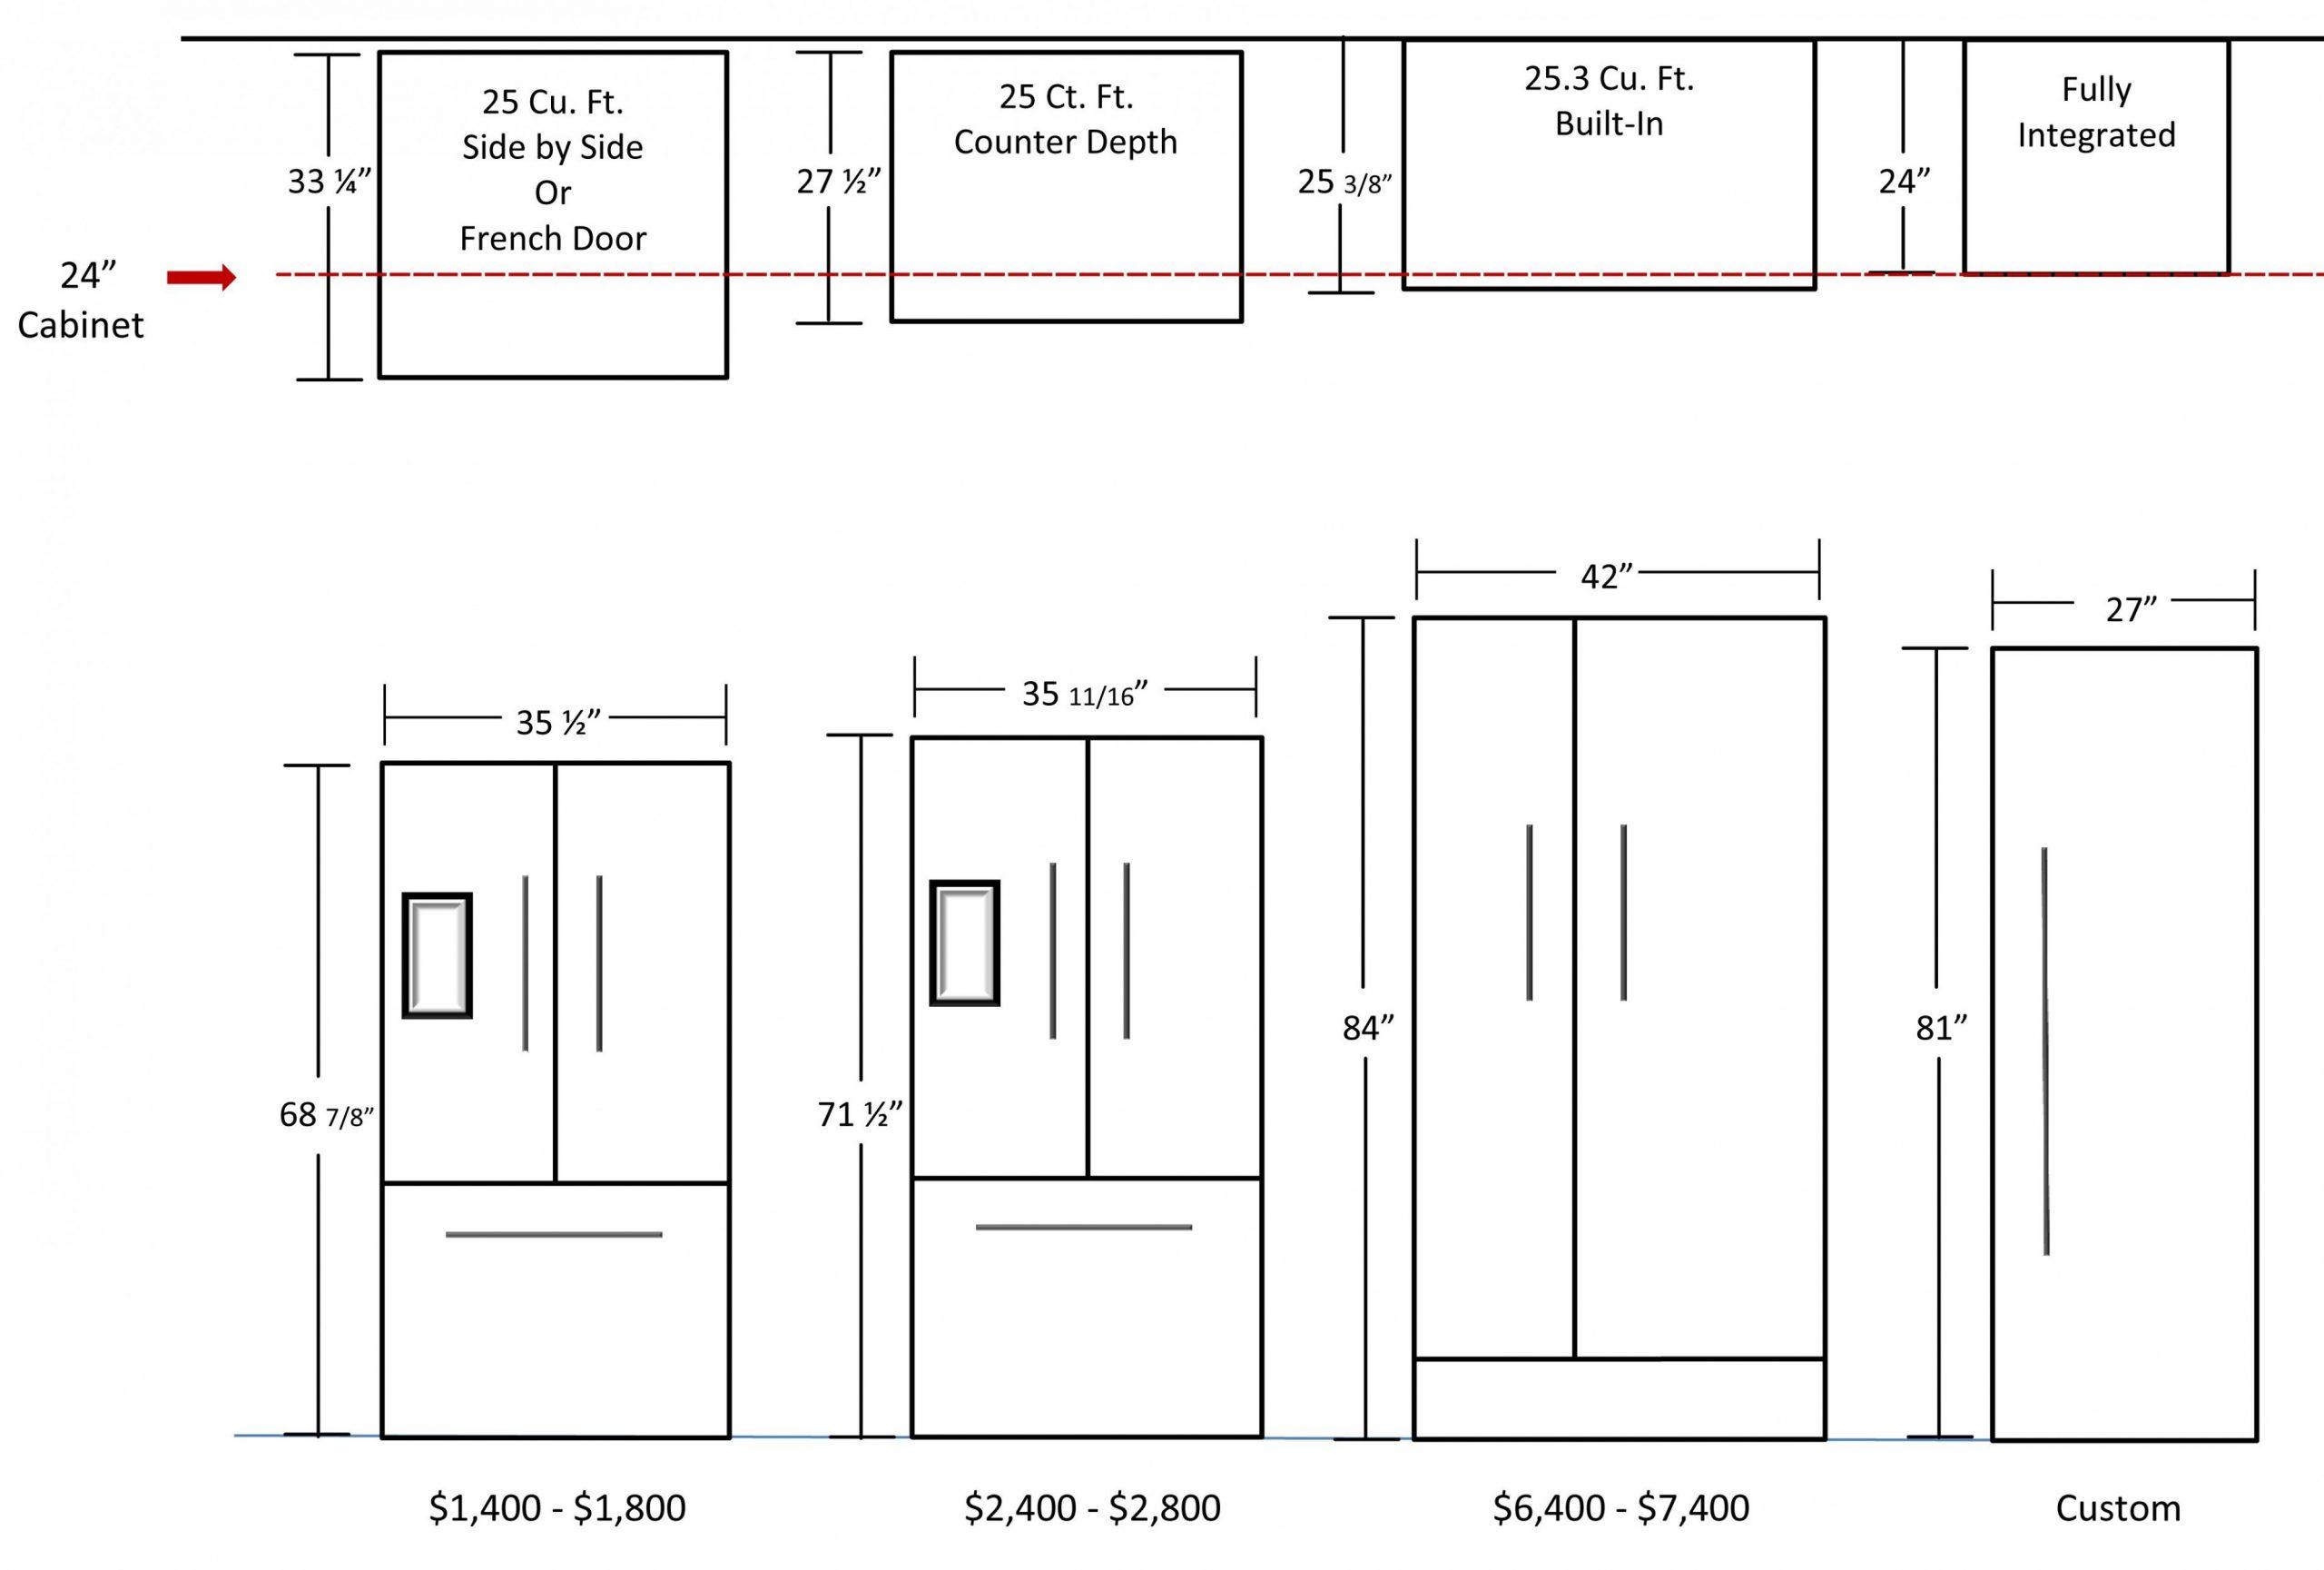 Images - average refrigerator size  Refrigerator dimensions  - Kitchen Cabinet Dimensions Refrigerator